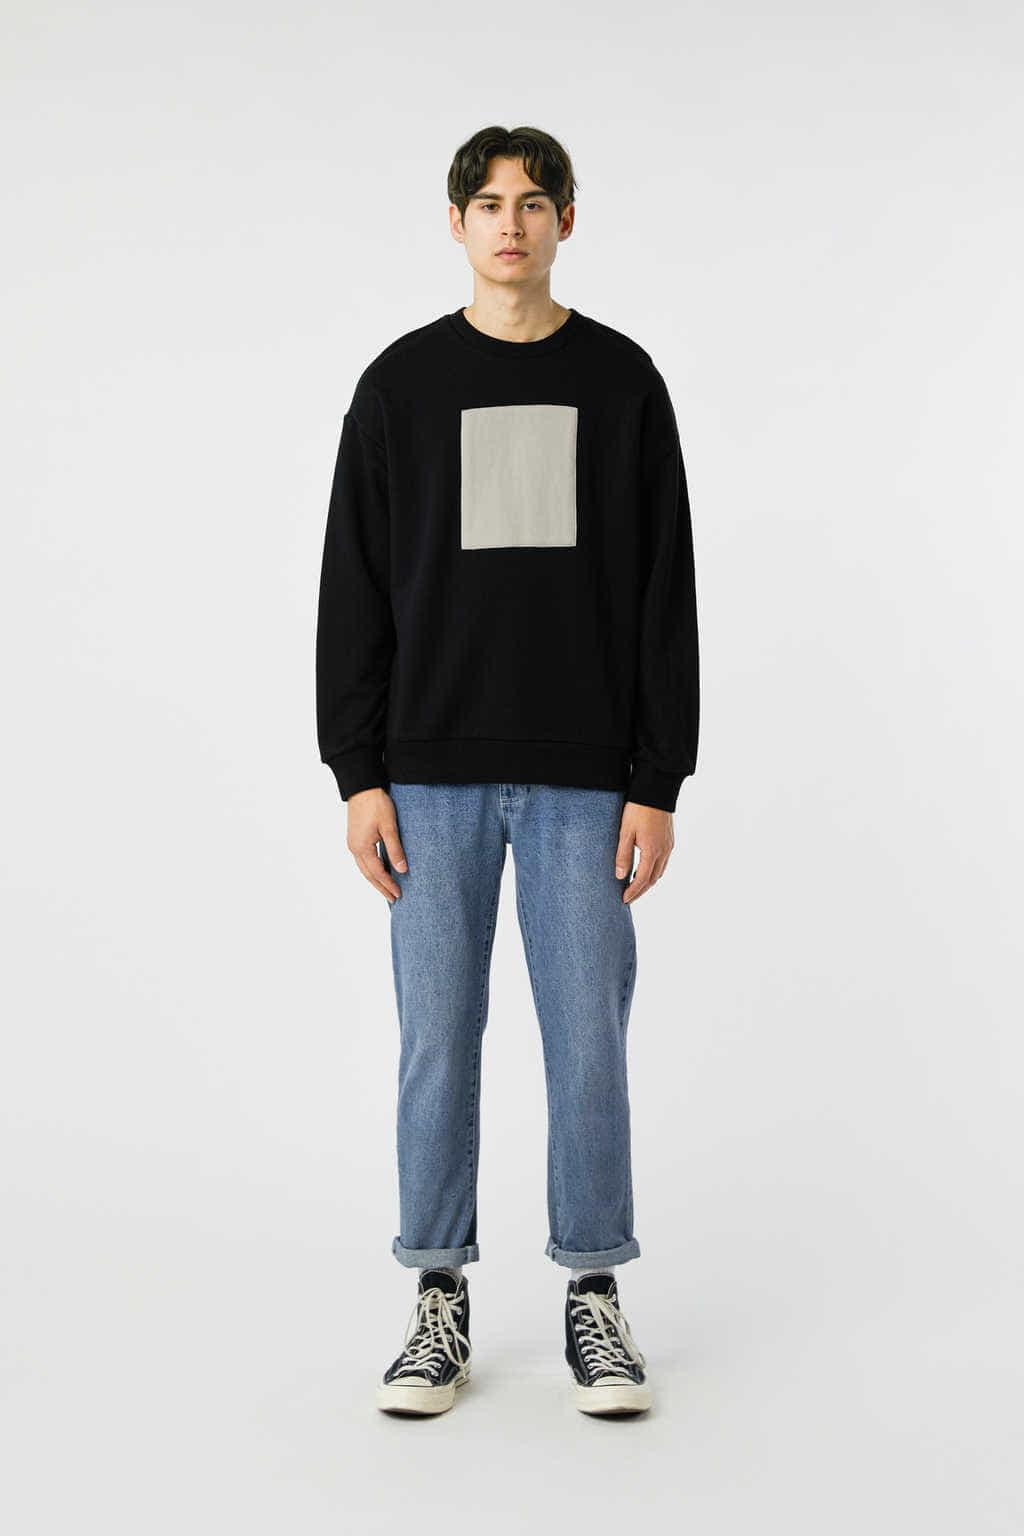 Sweatshirt 3138 Black 15